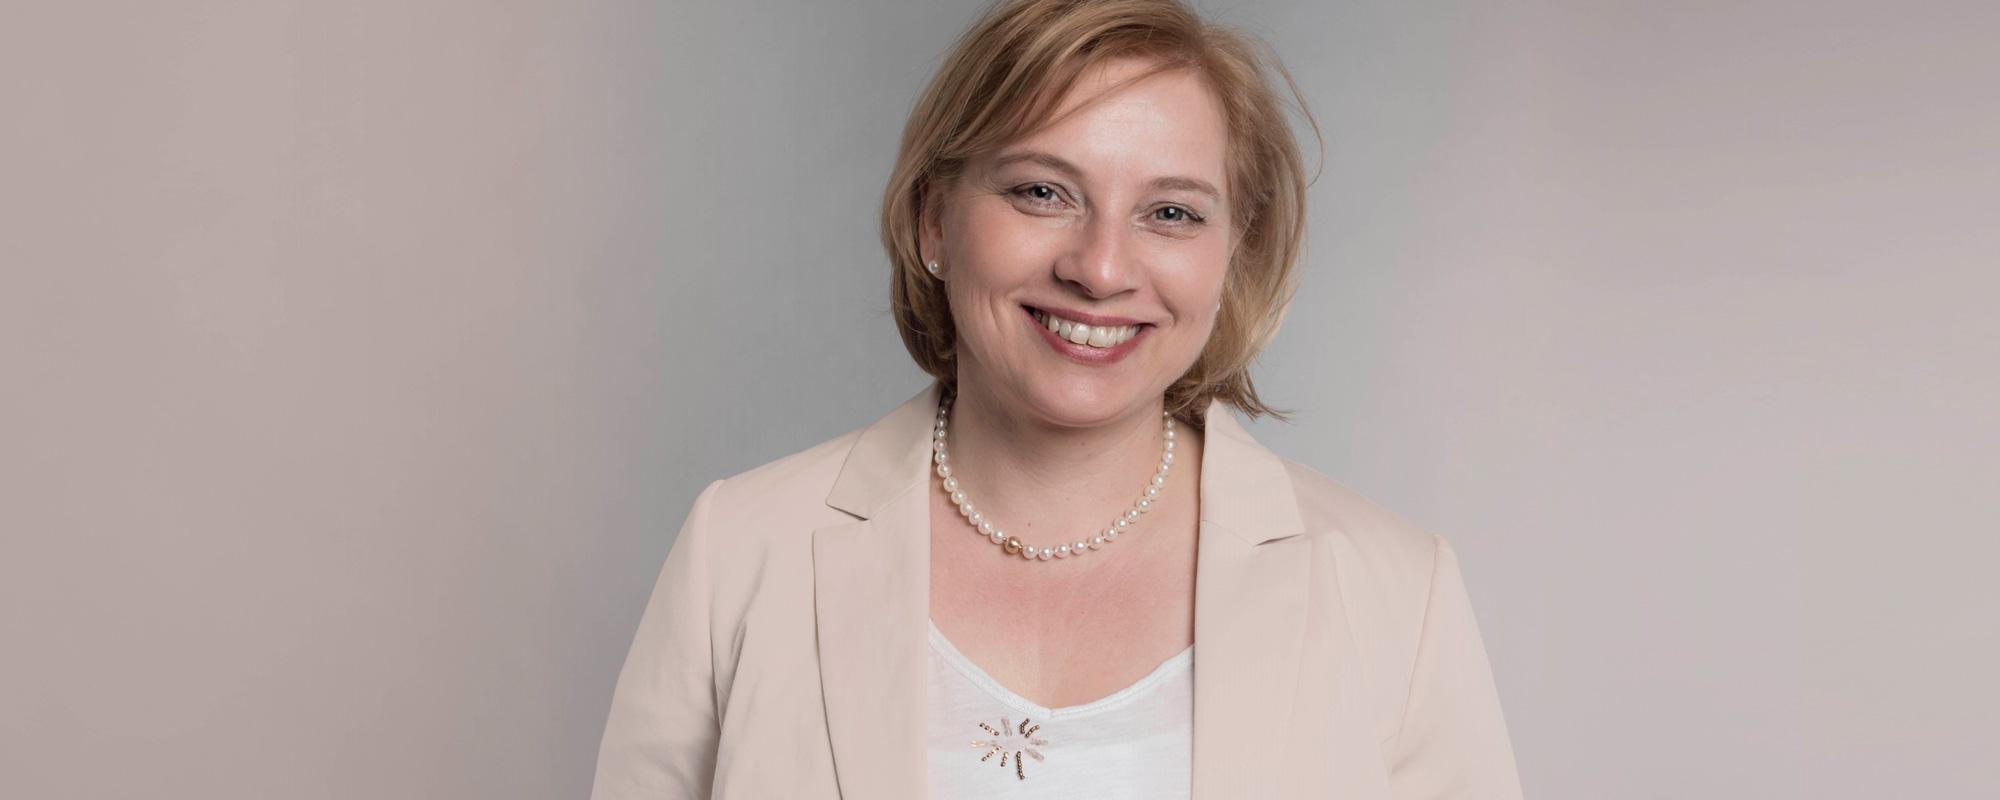 Heidi Steegmaier-Schunter